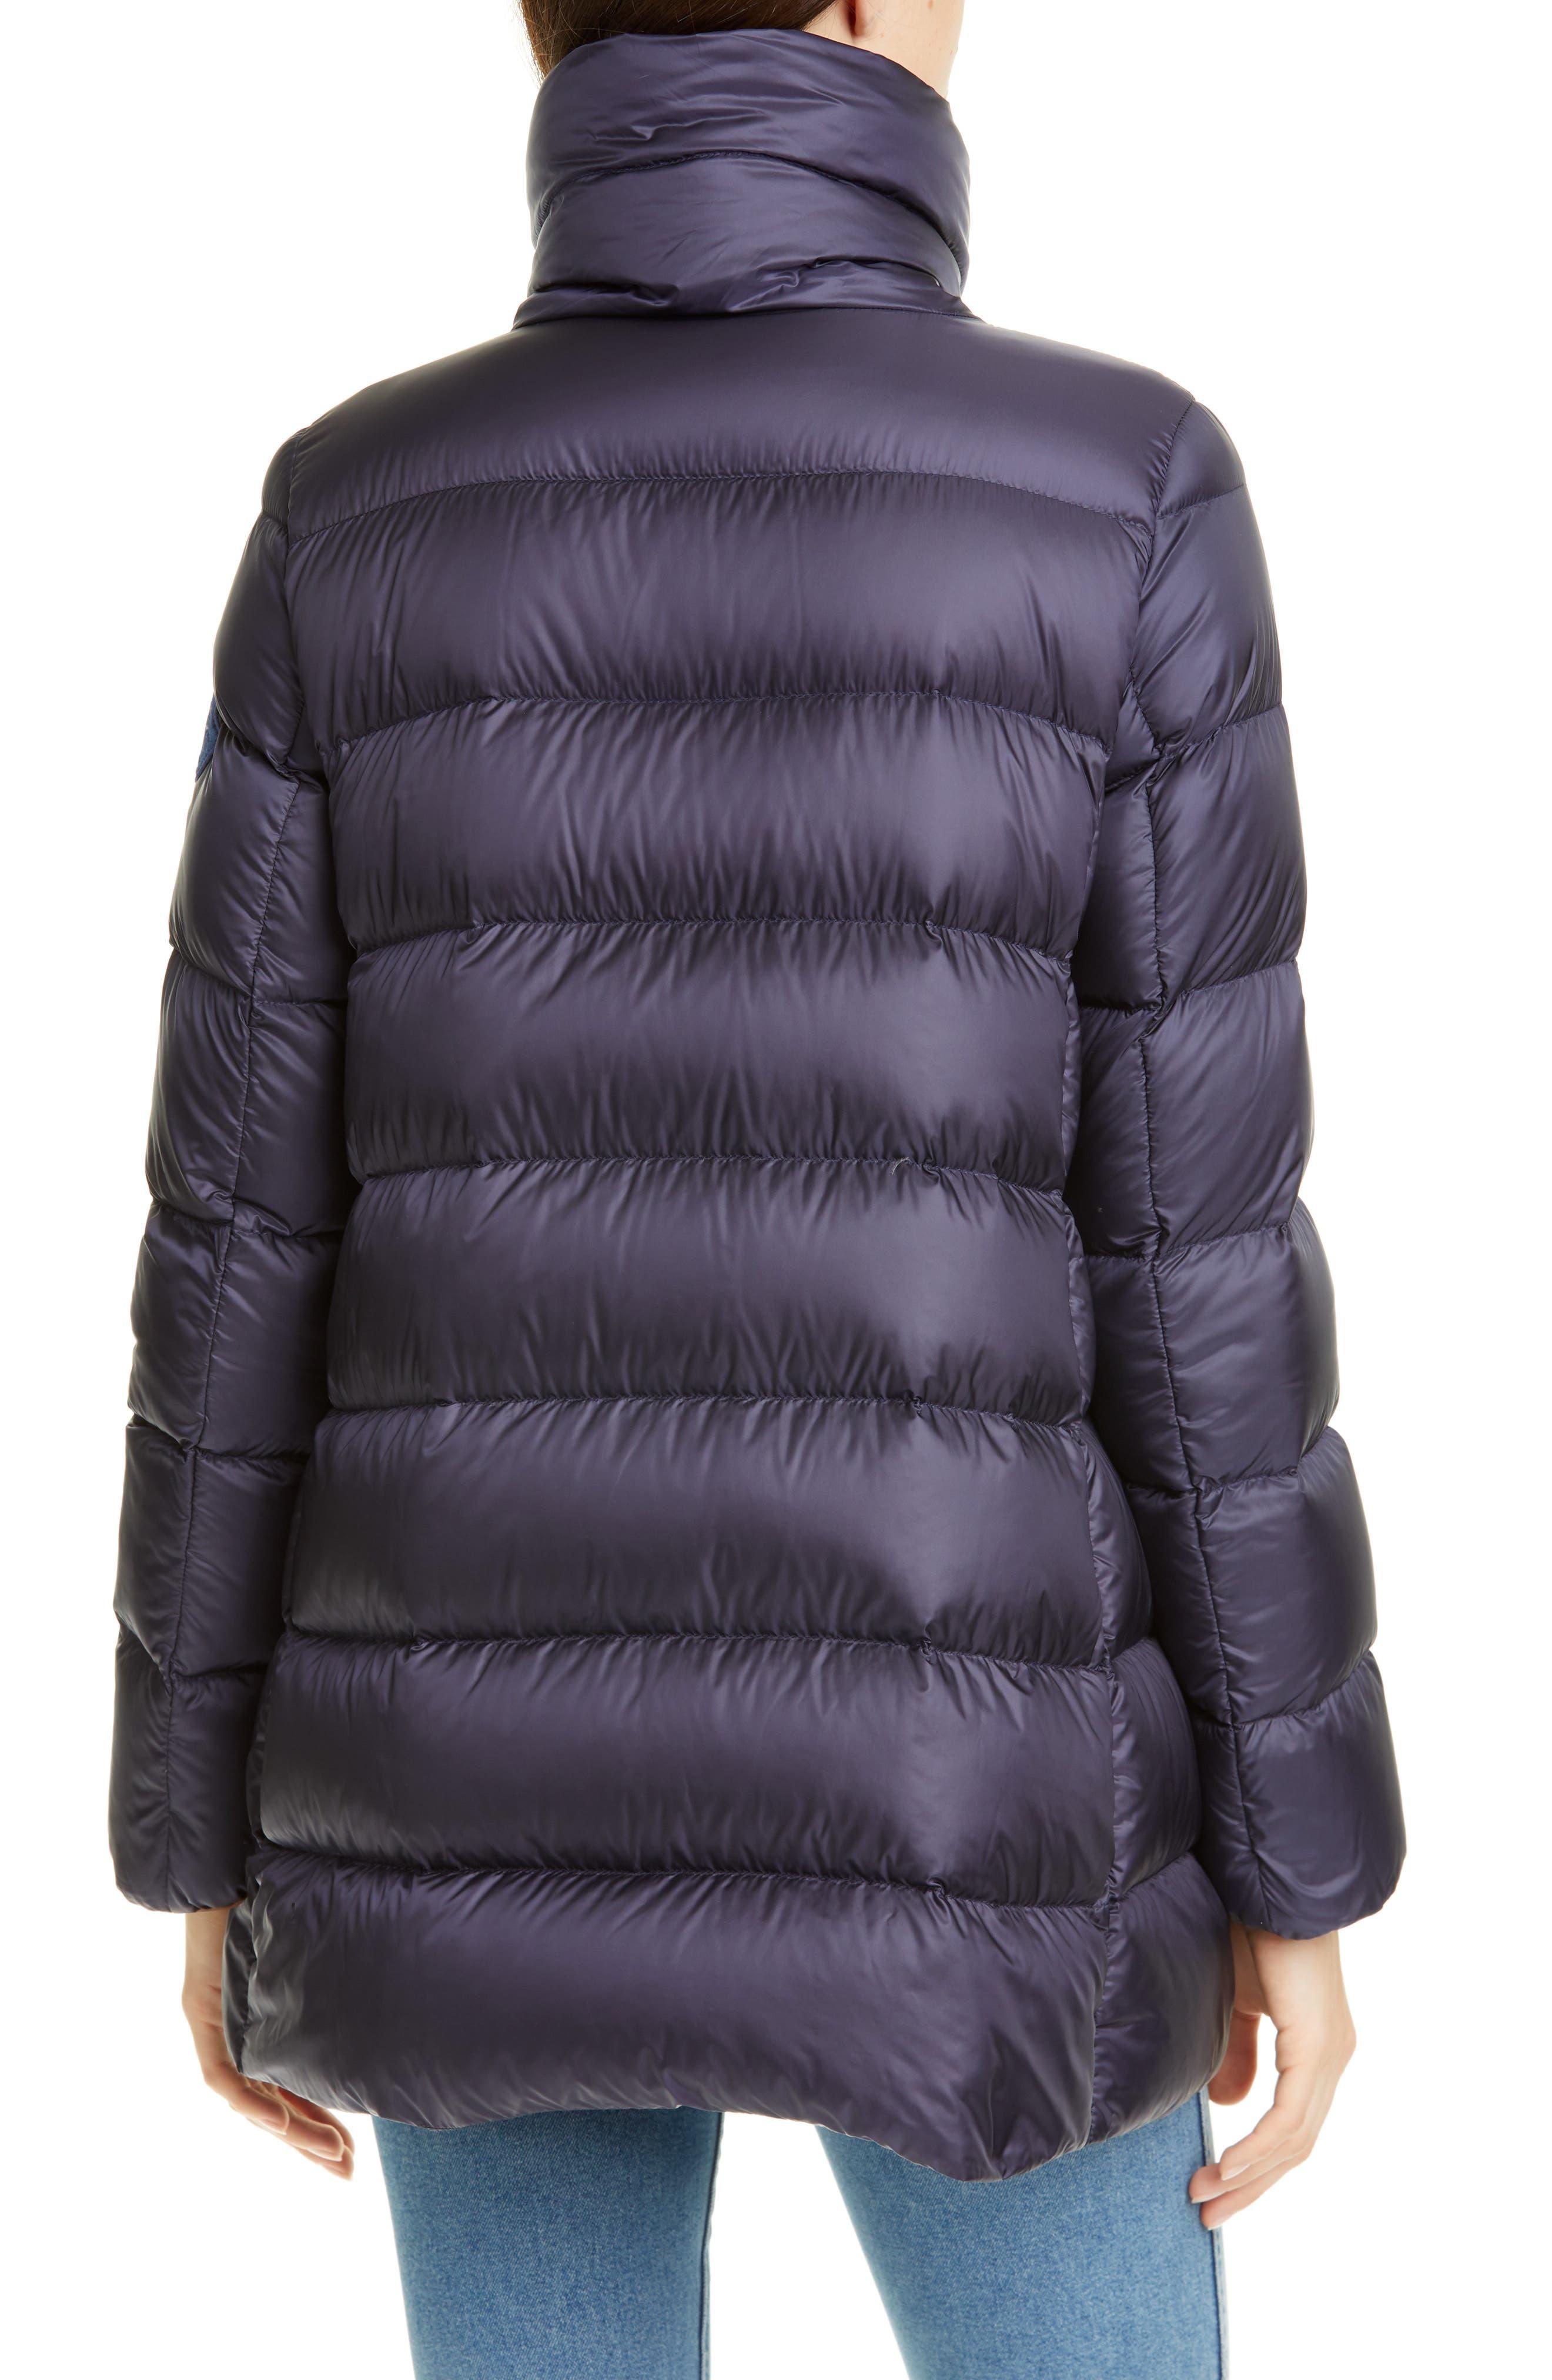 42b74a88170 Women's Velvet Coats & Jackets | Nordstrom